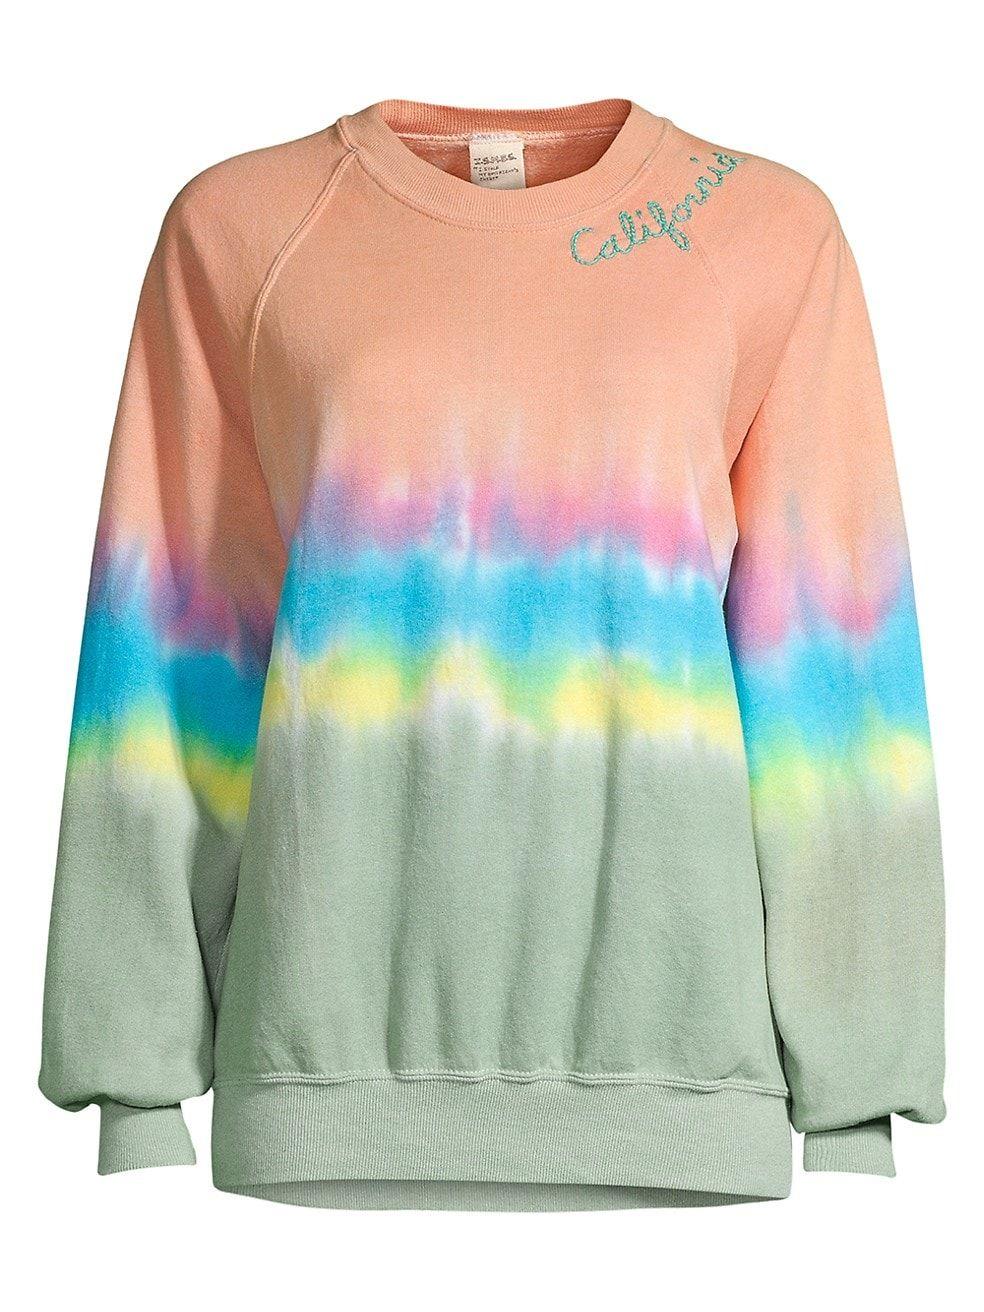 I Stole My Boyfriend S Shirt California Tie Dye Crewneck Sweatshirt Saksfifthavenue In 2021 Tie Dye Crewneck Sweatshirts Boyfriend Shirt Tie Dye Shirts Patterns [ 1312 x 984 Pixel ]